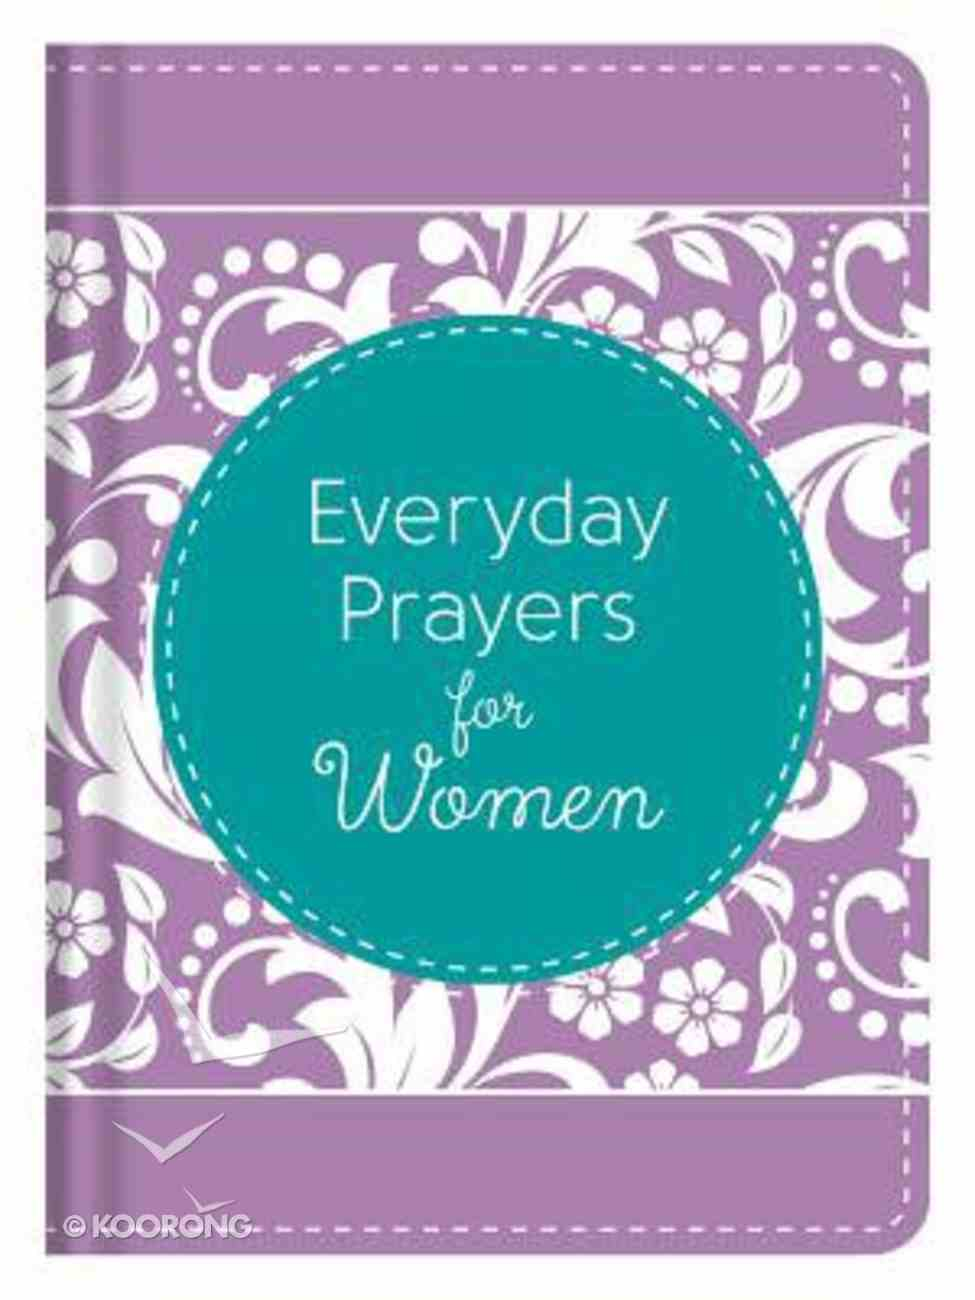 Everyday Prayers For Women Imitation Leather